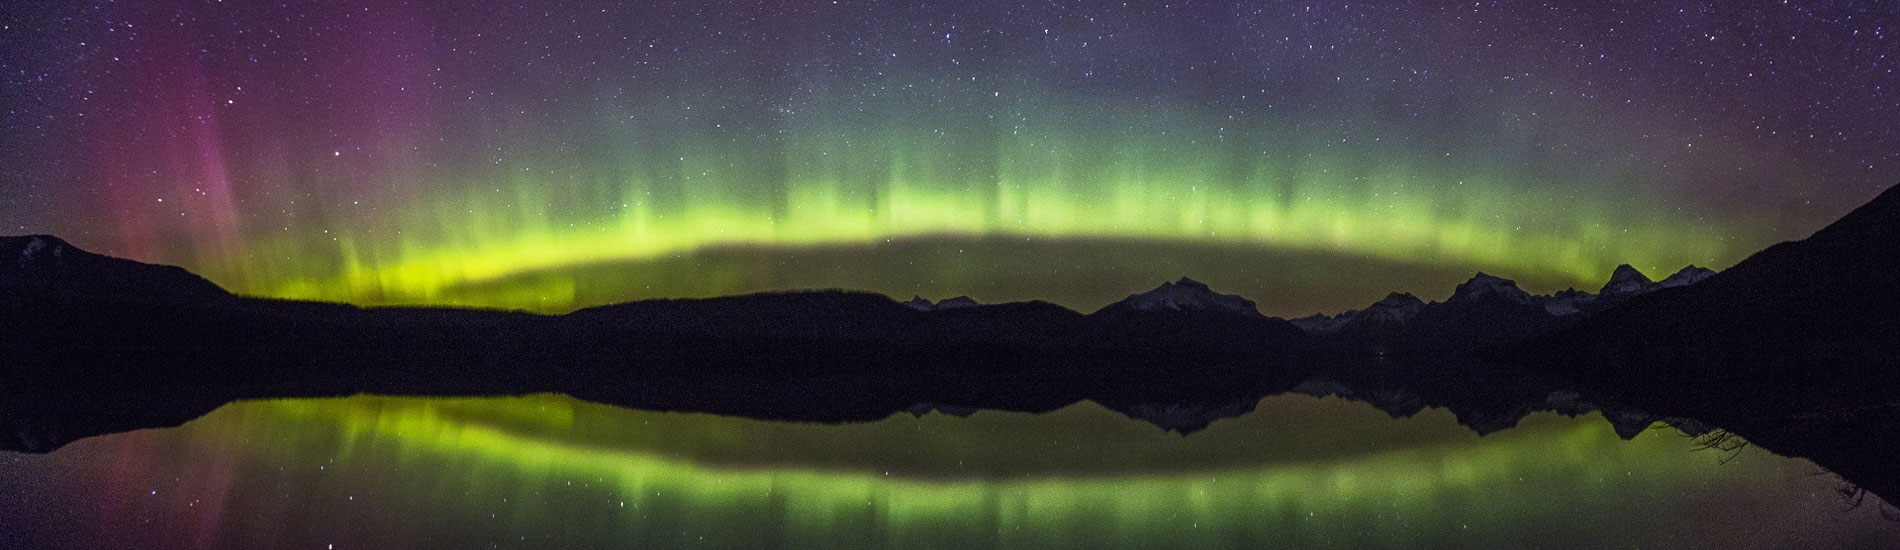 Joel Magnes, Christian Science Healing Aurora Borealis